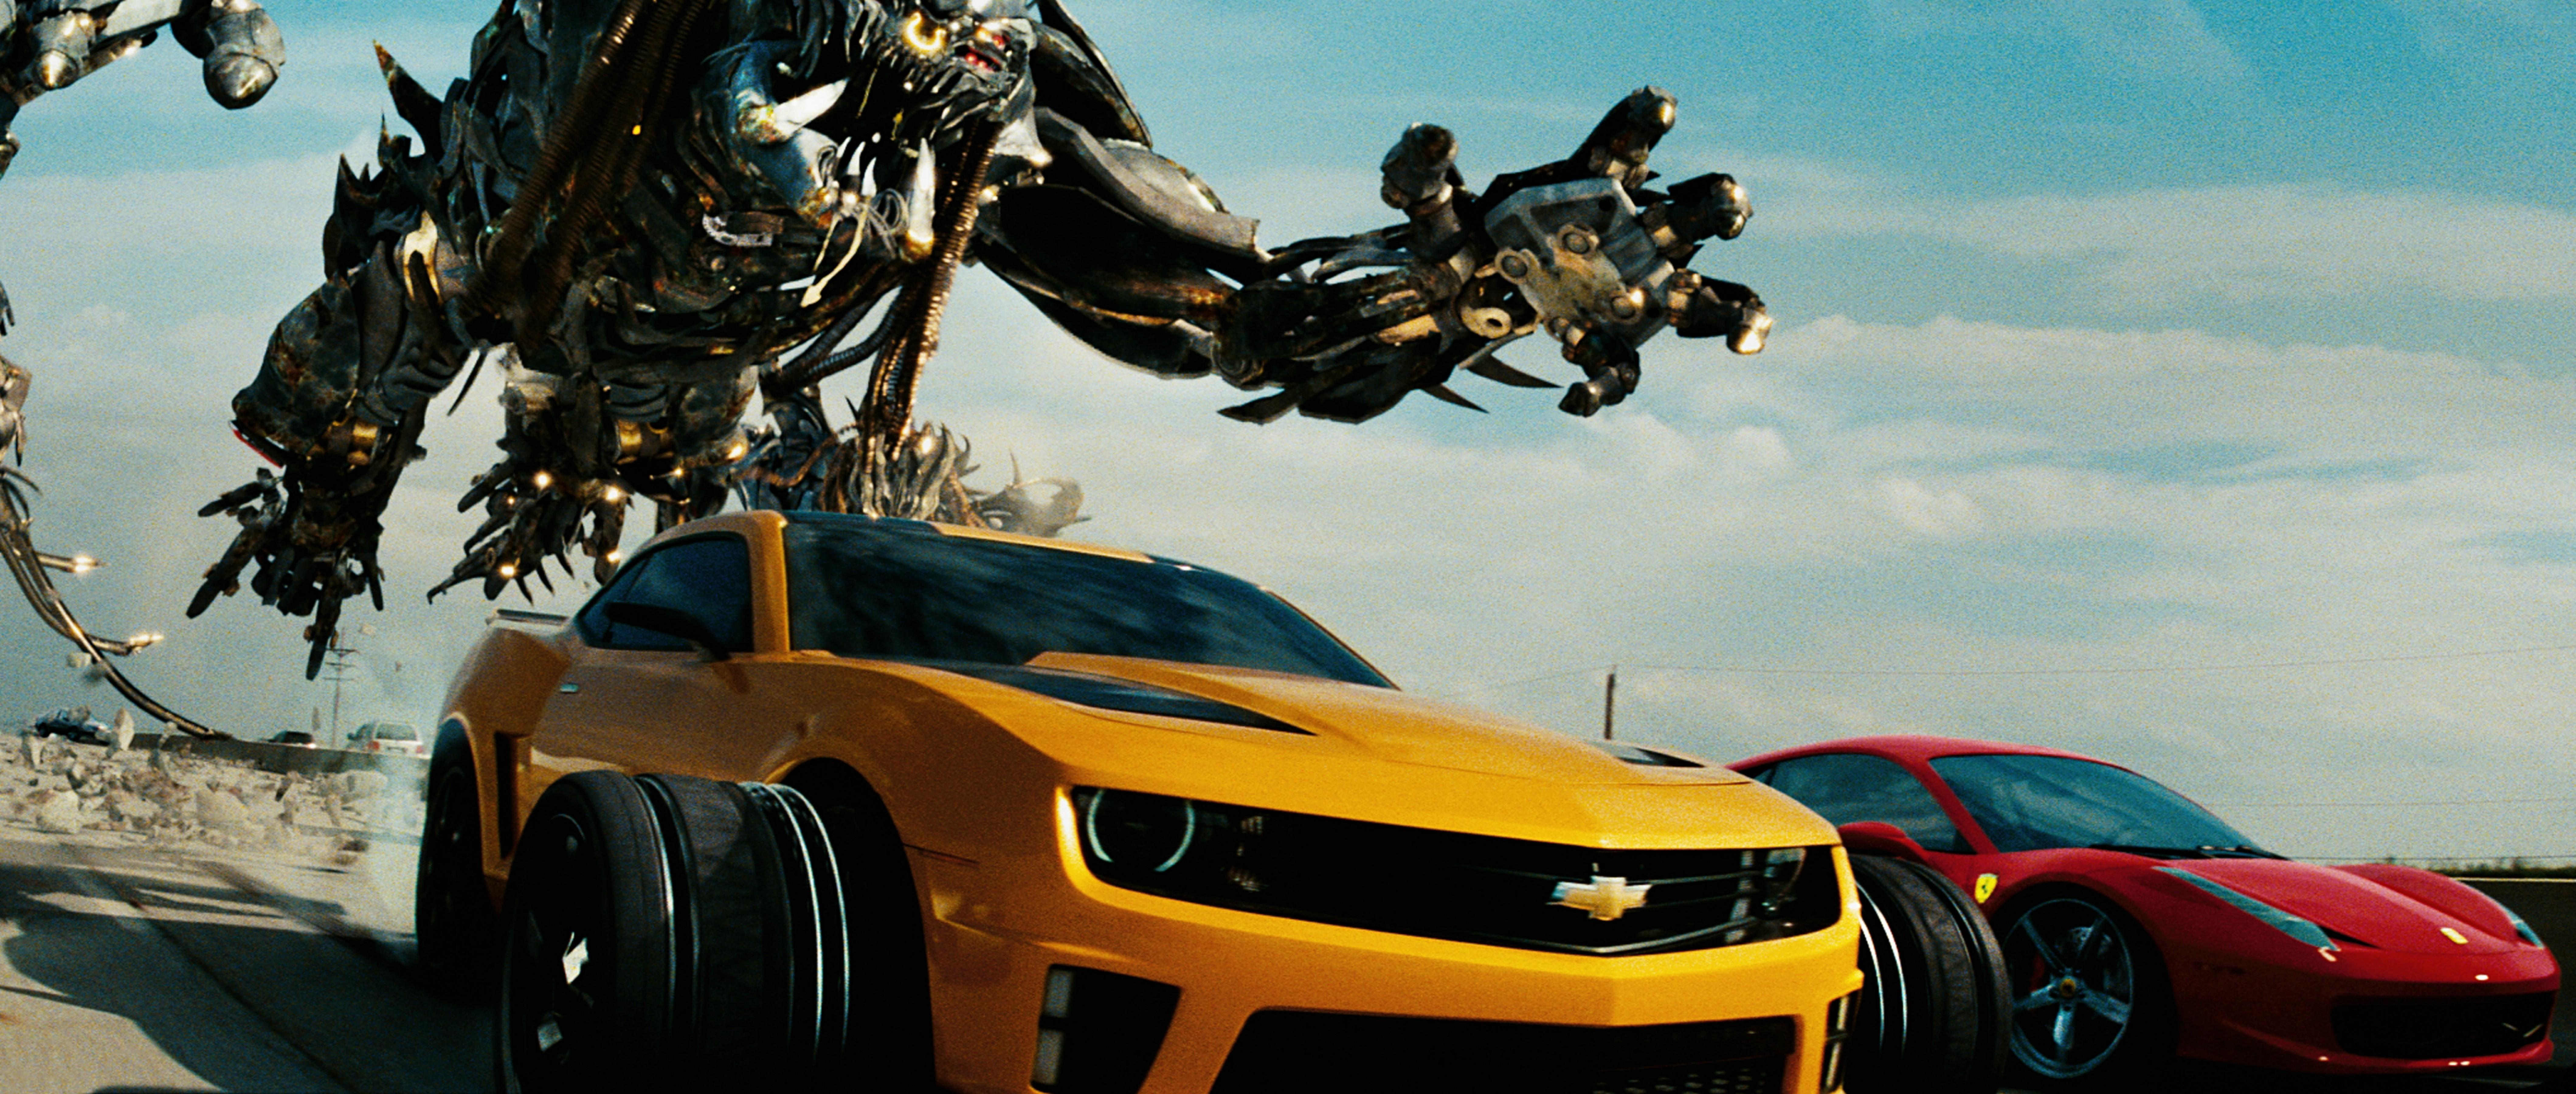 Transformers 3 - La face cachée de la Lune Combo Blu-ray